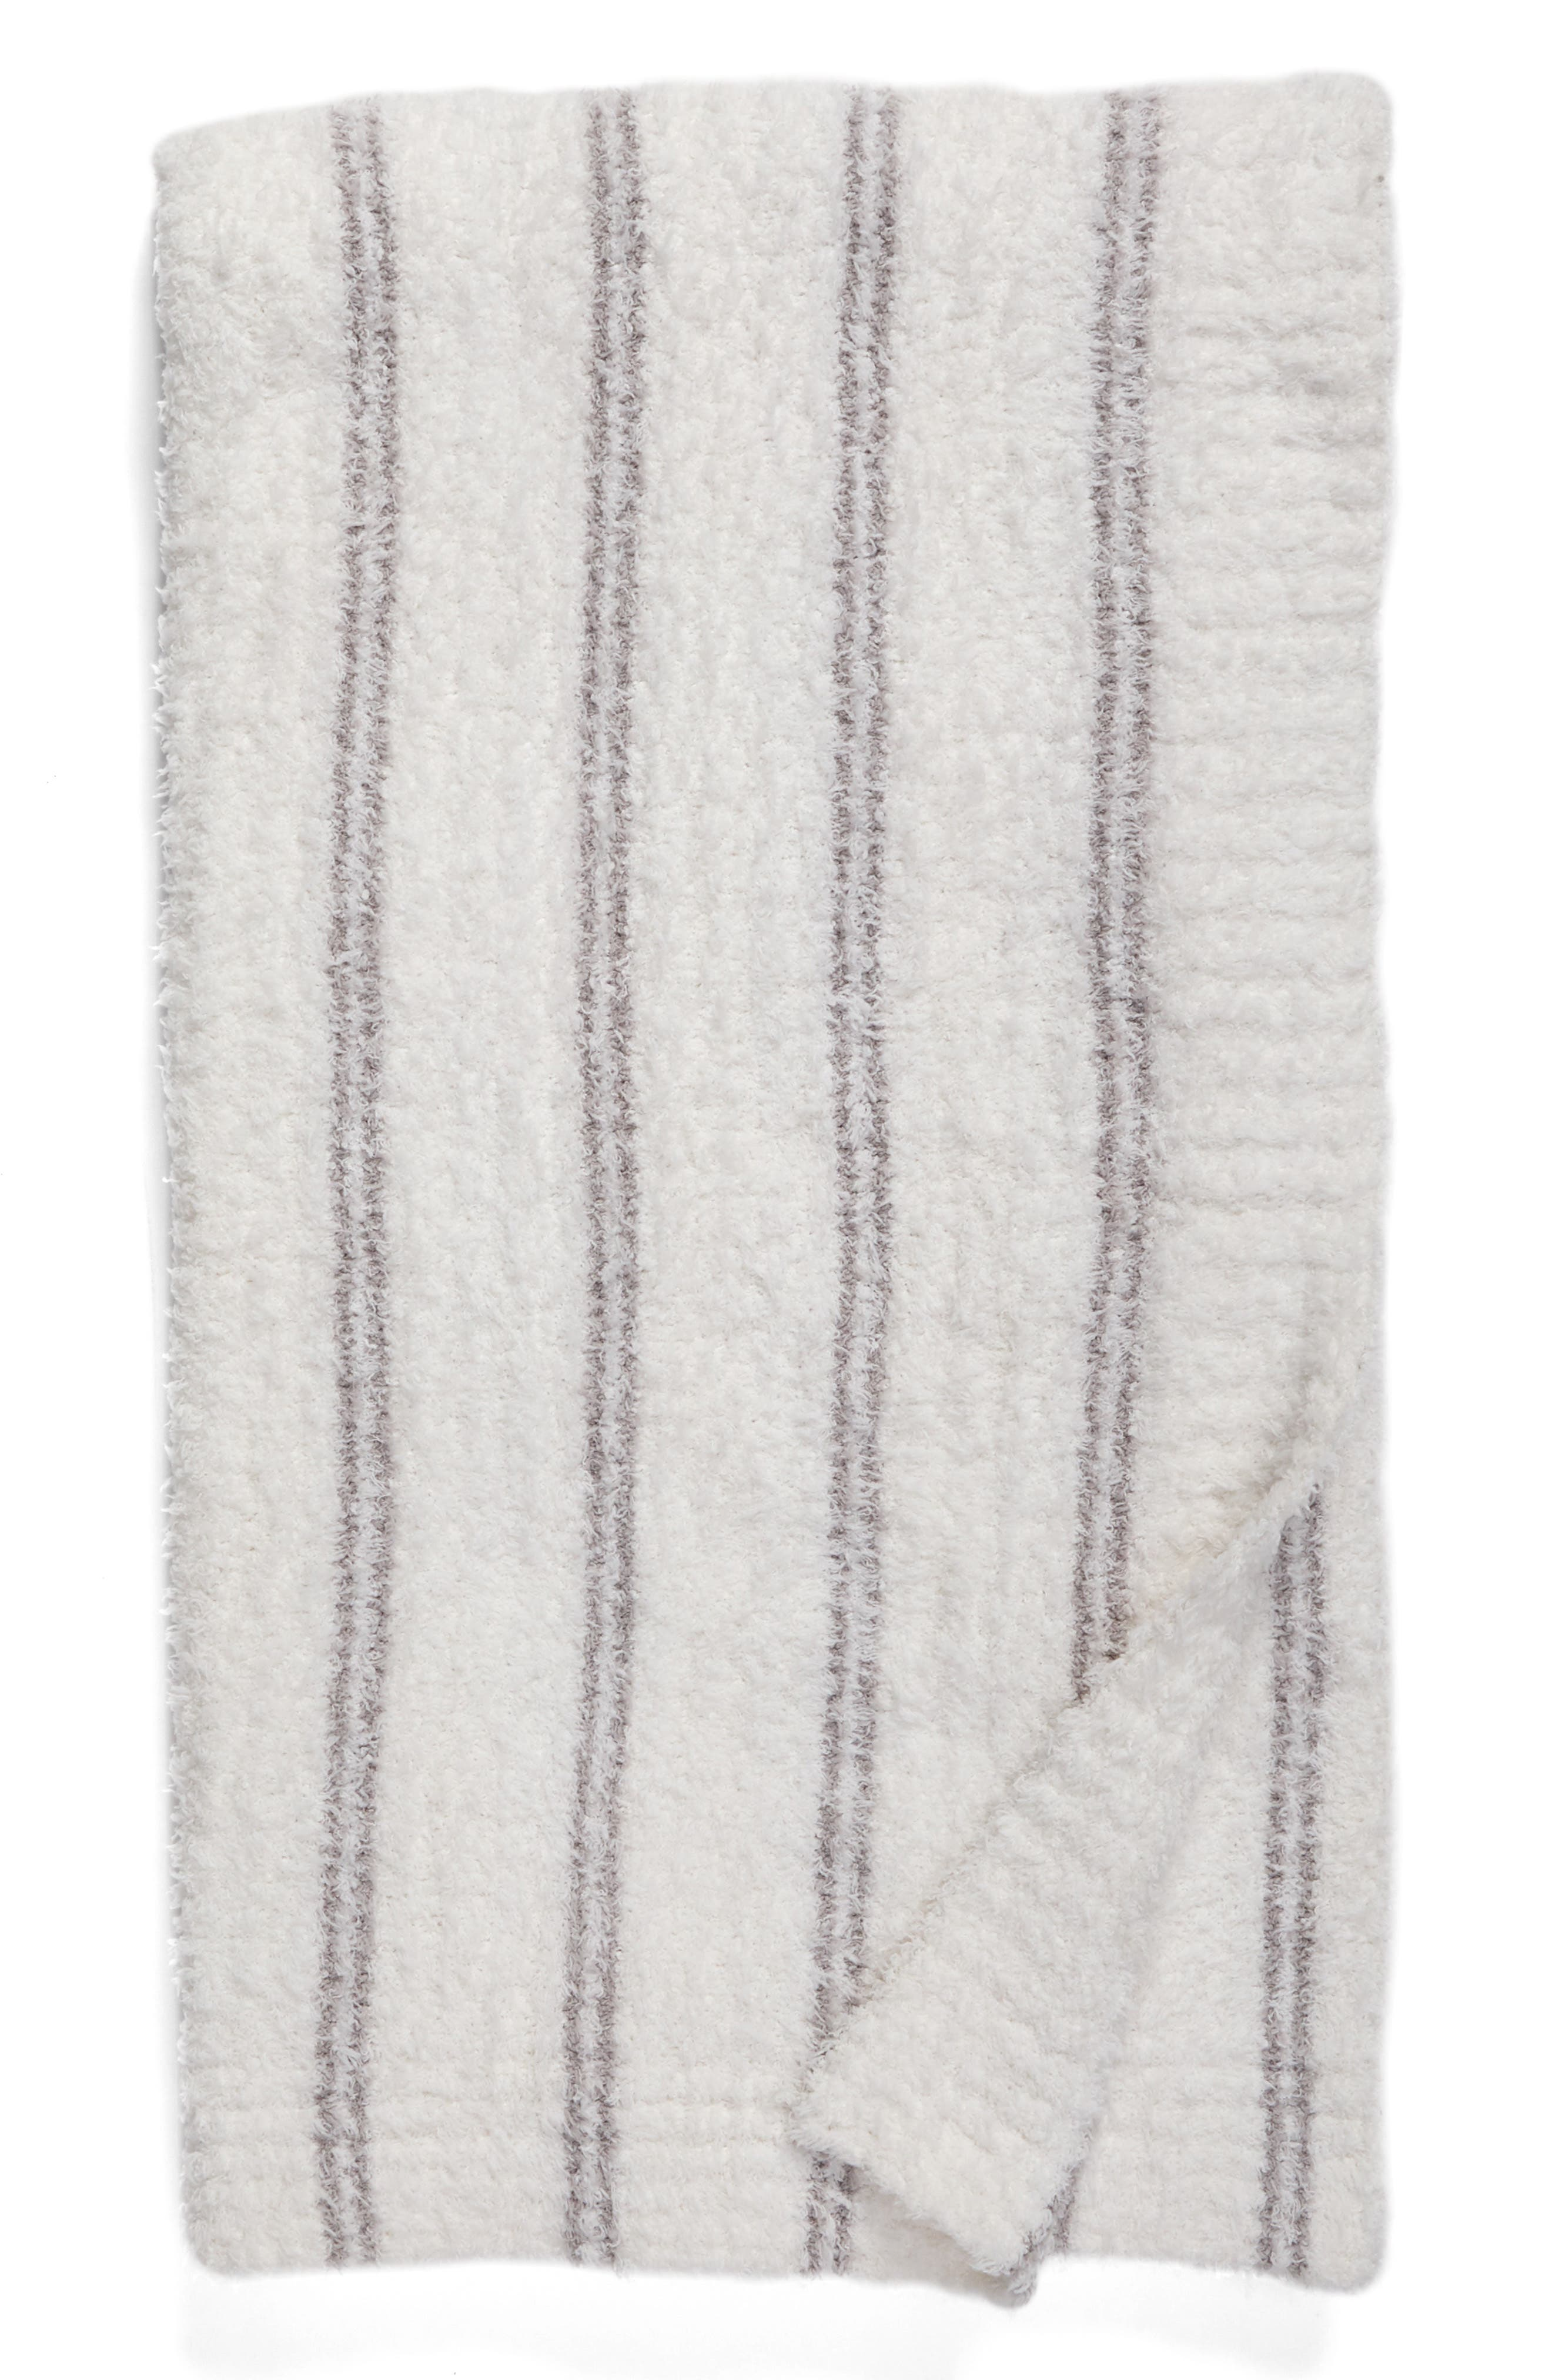 Main Image - Barefoot Dreams® Cozychic® Vertical Stripe Throw Blanket